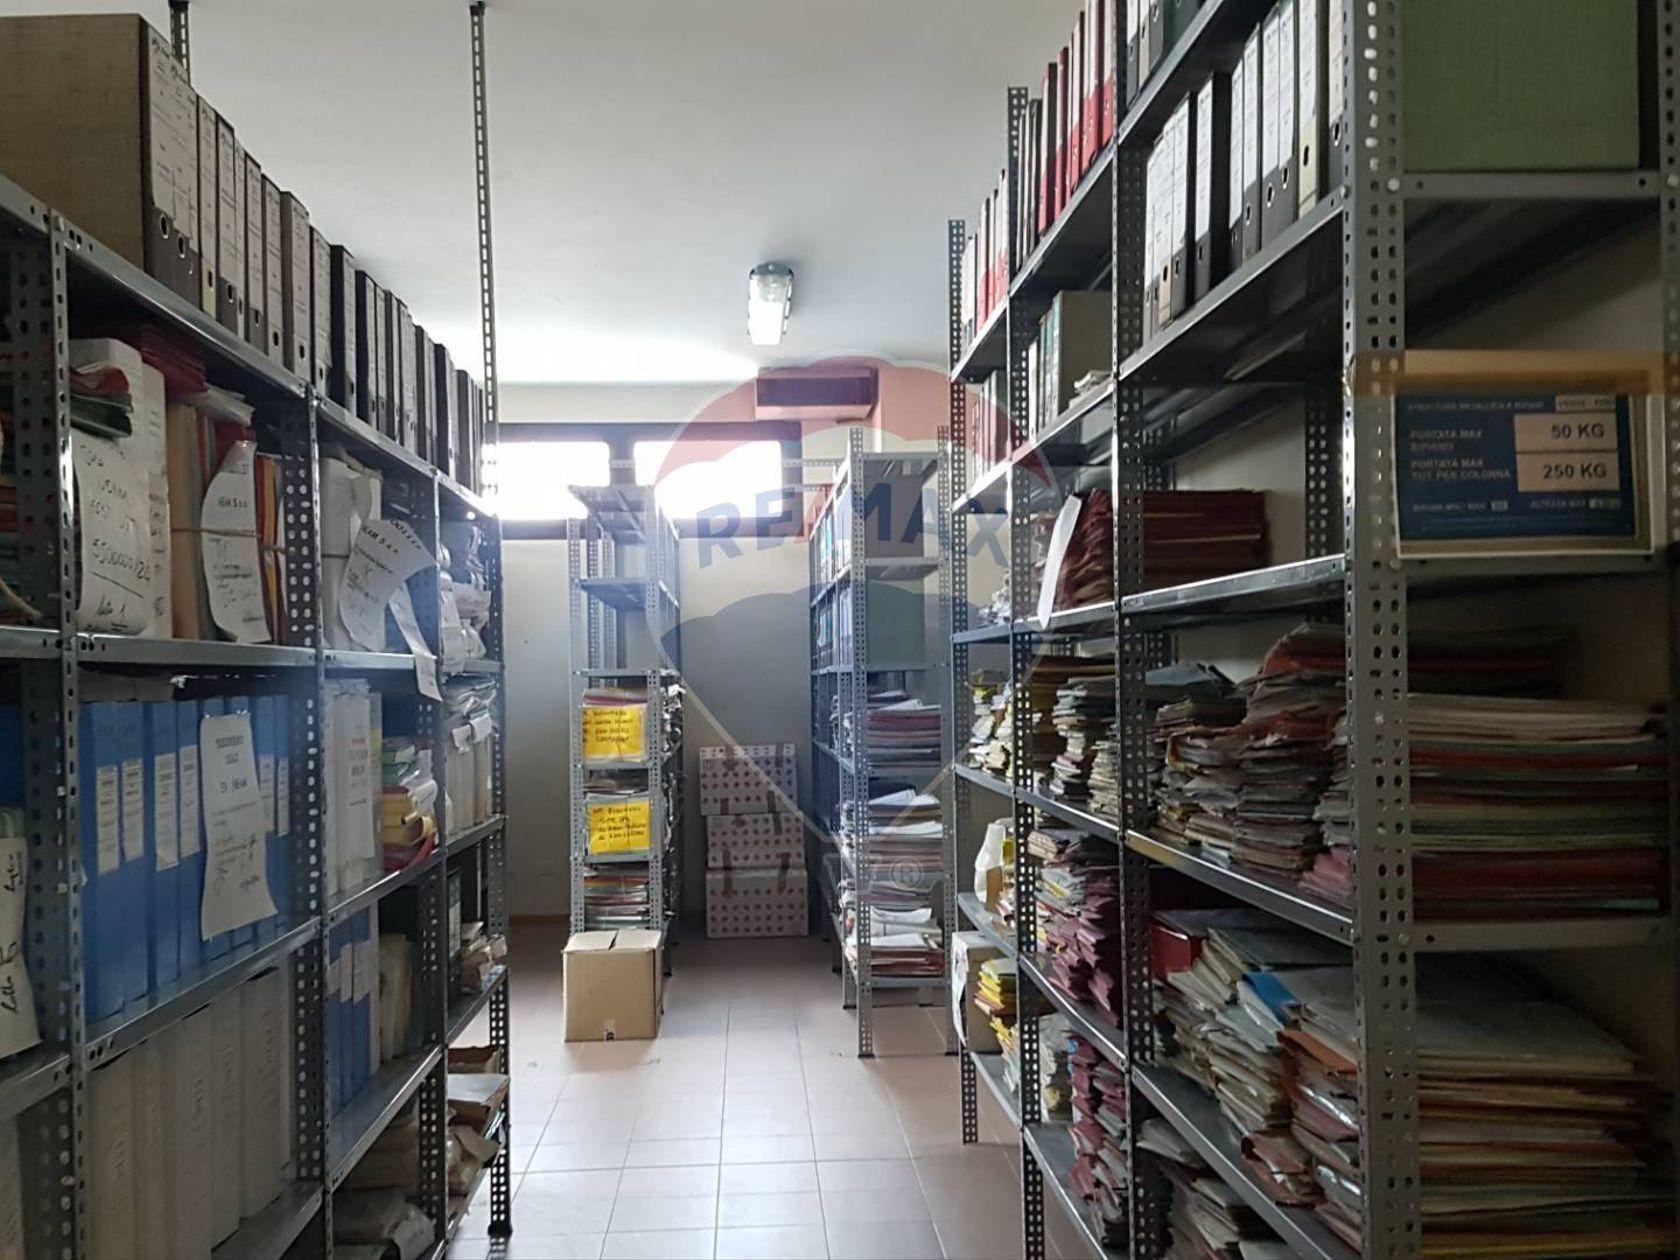 Locale Commerciale San Donà di Piave, VE Vendita - Foto 10